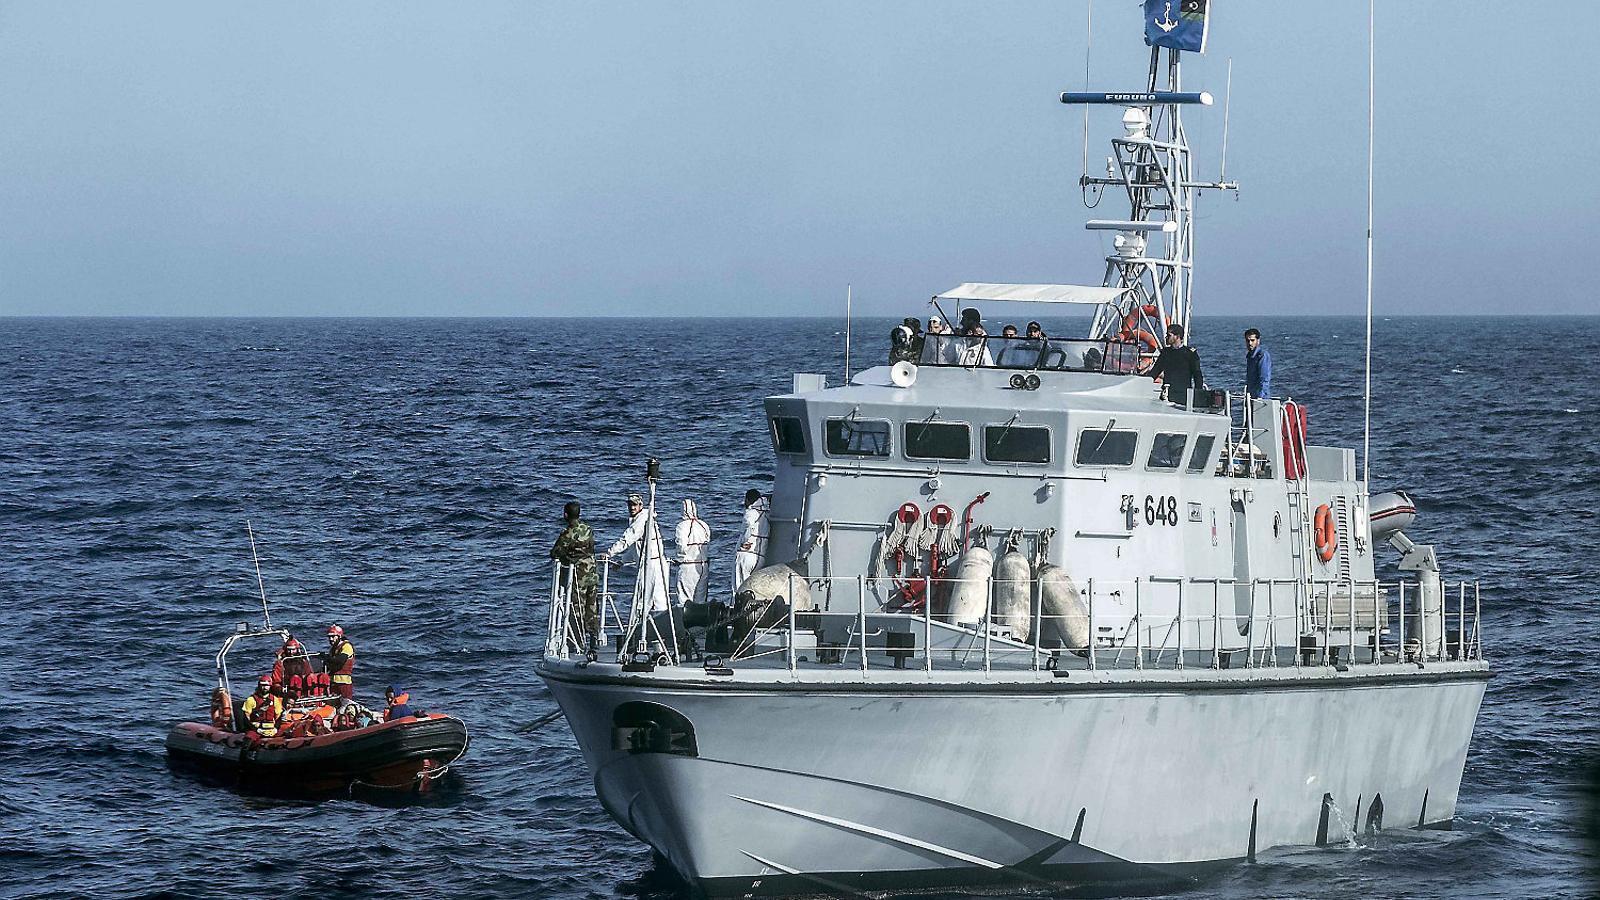 Guardacostes libis  amenacen de mort  Open Arms en un rescat